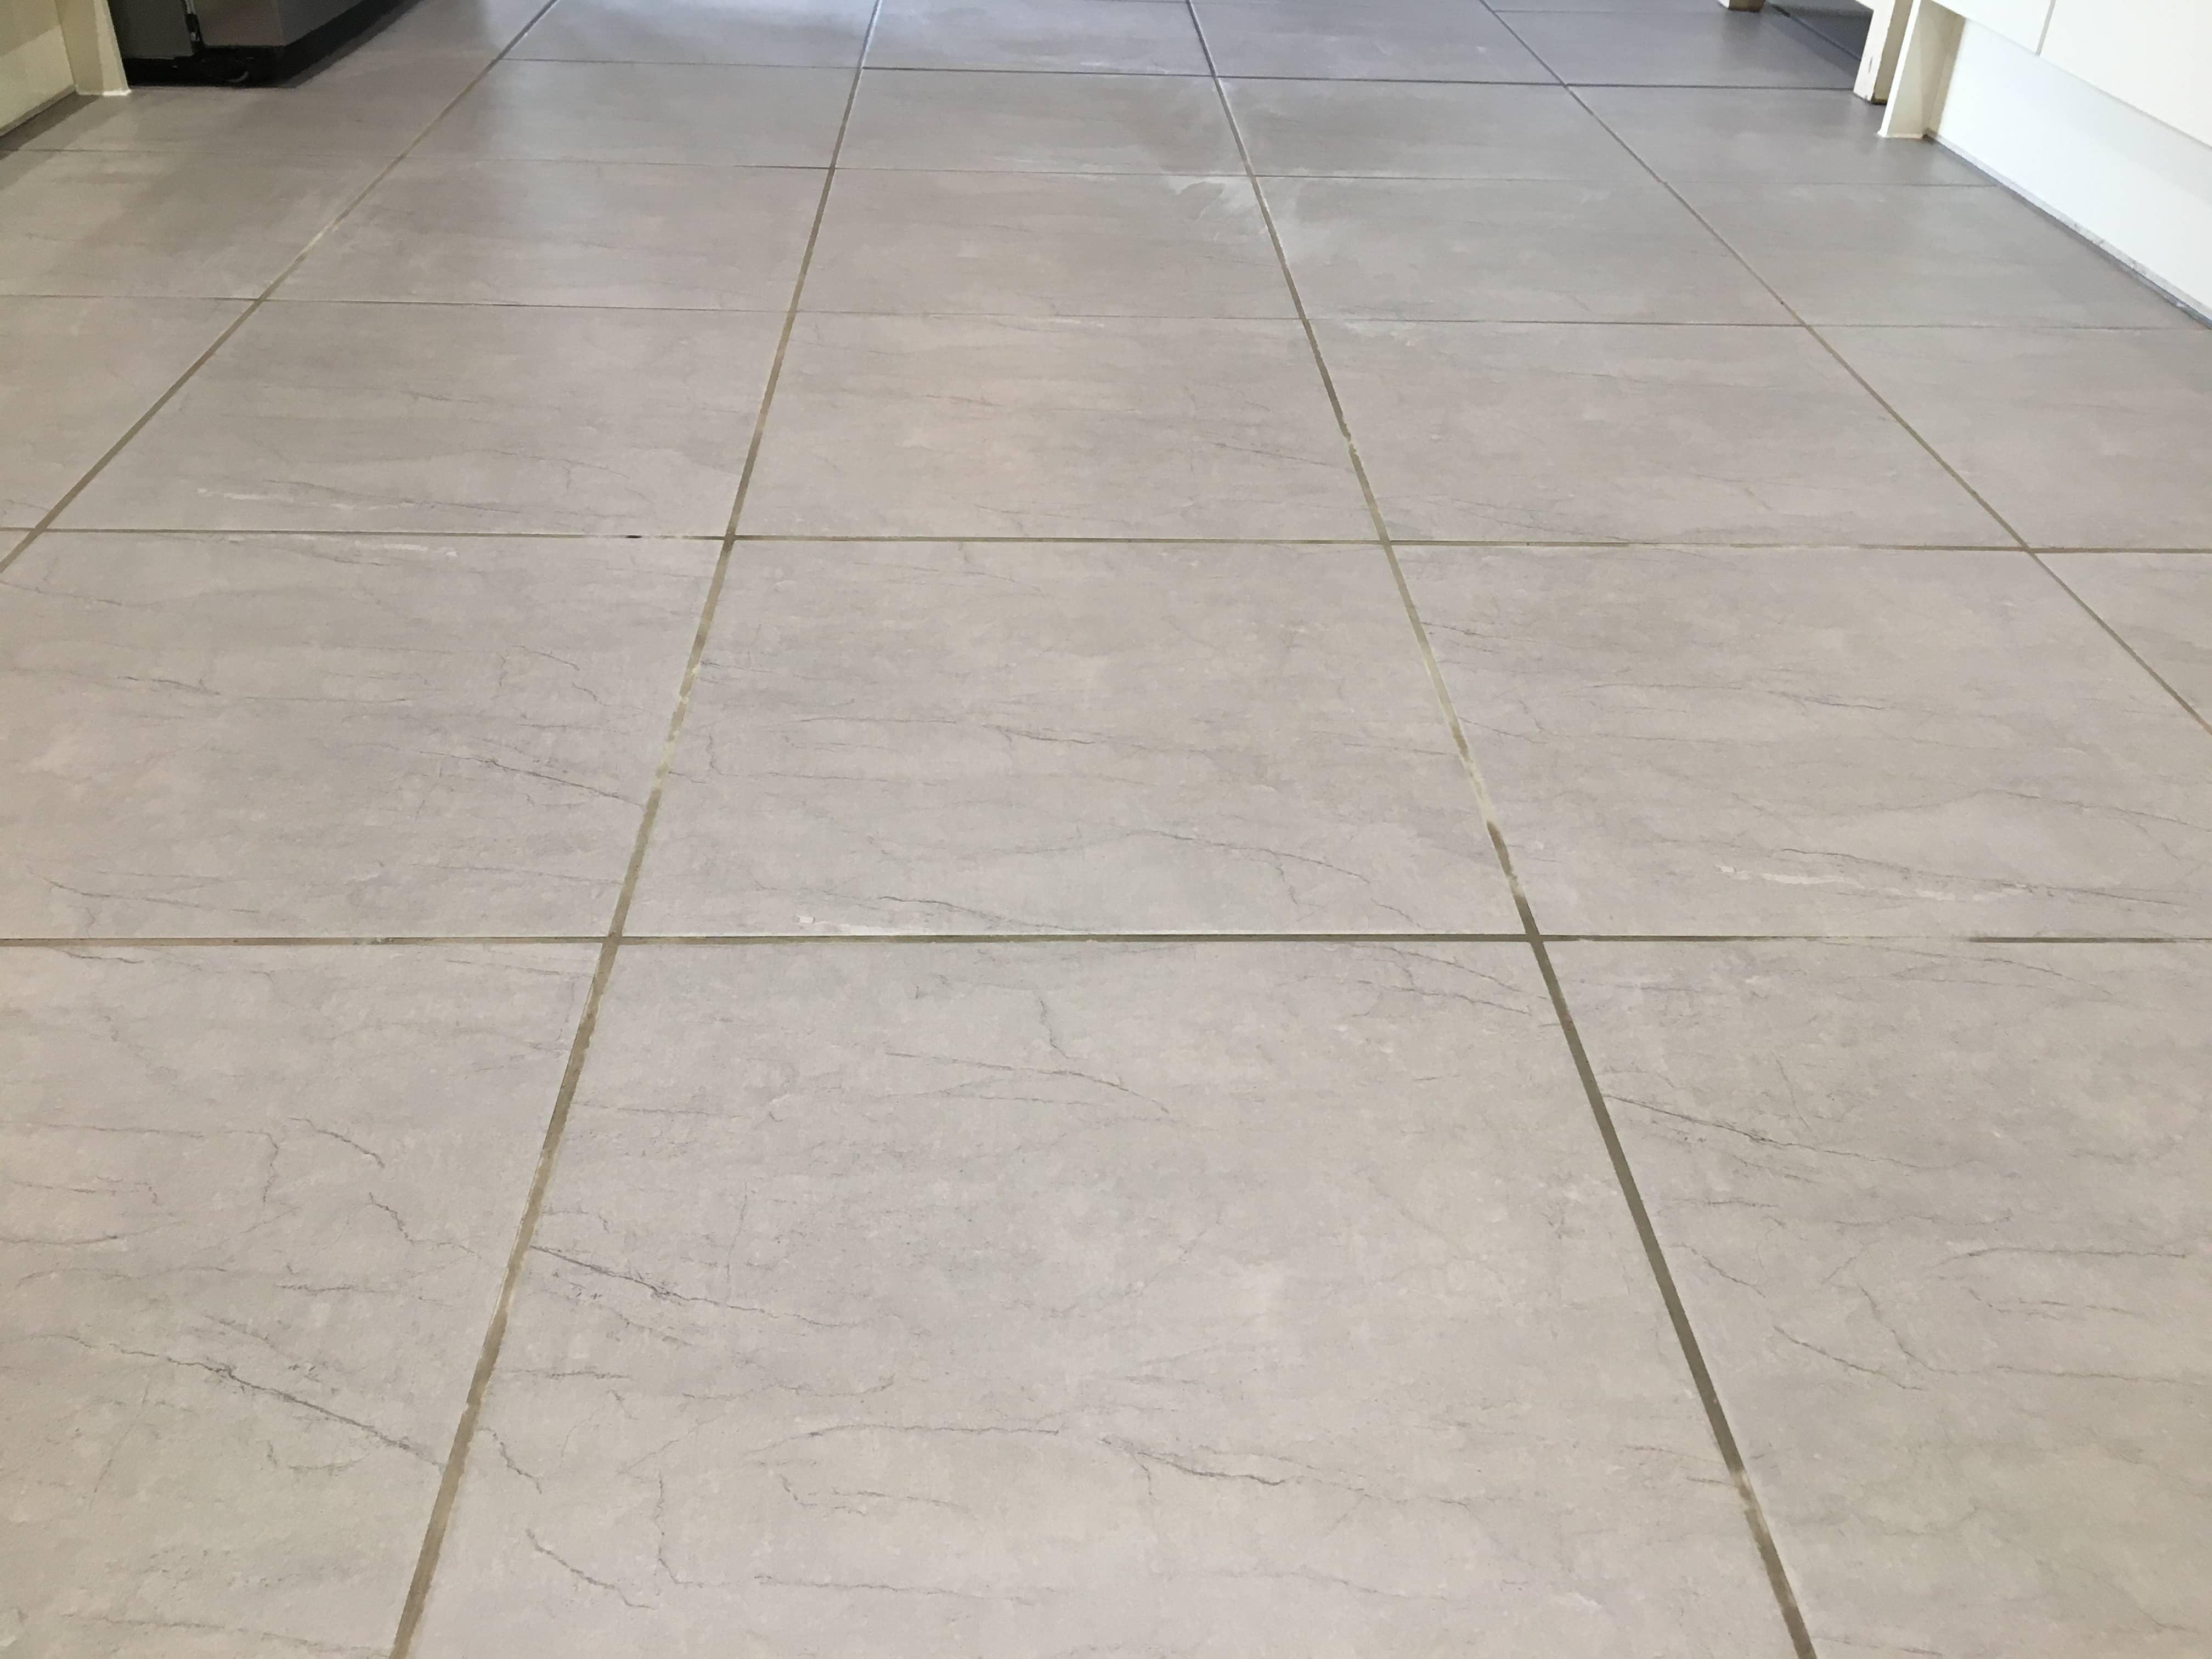 Ceramic Tiled Floor Before Grout Colouring Shrewsbury